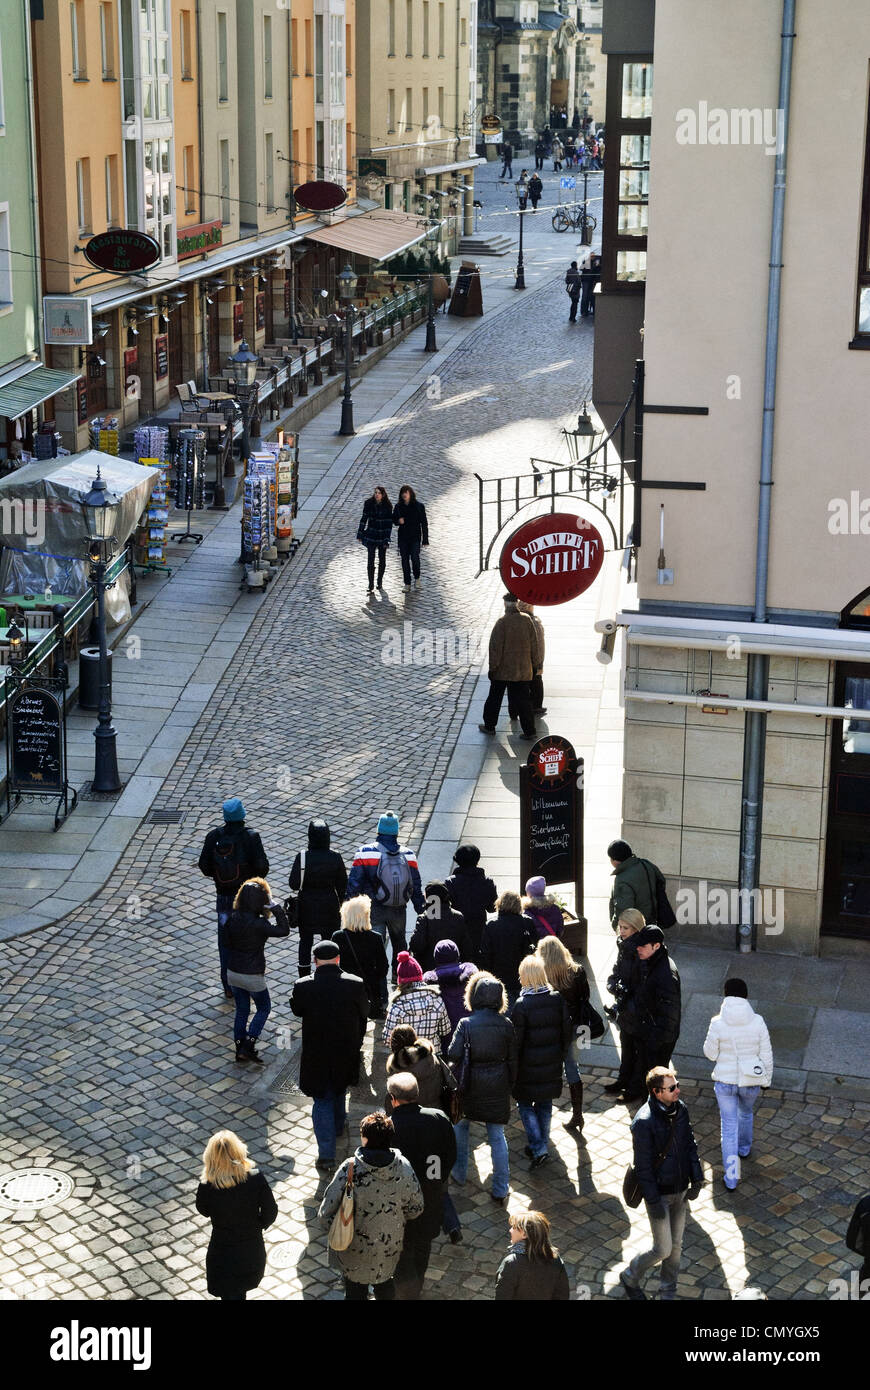 Munzgasse Street, Dresden, Germany - Mar 2011 - Stock Image